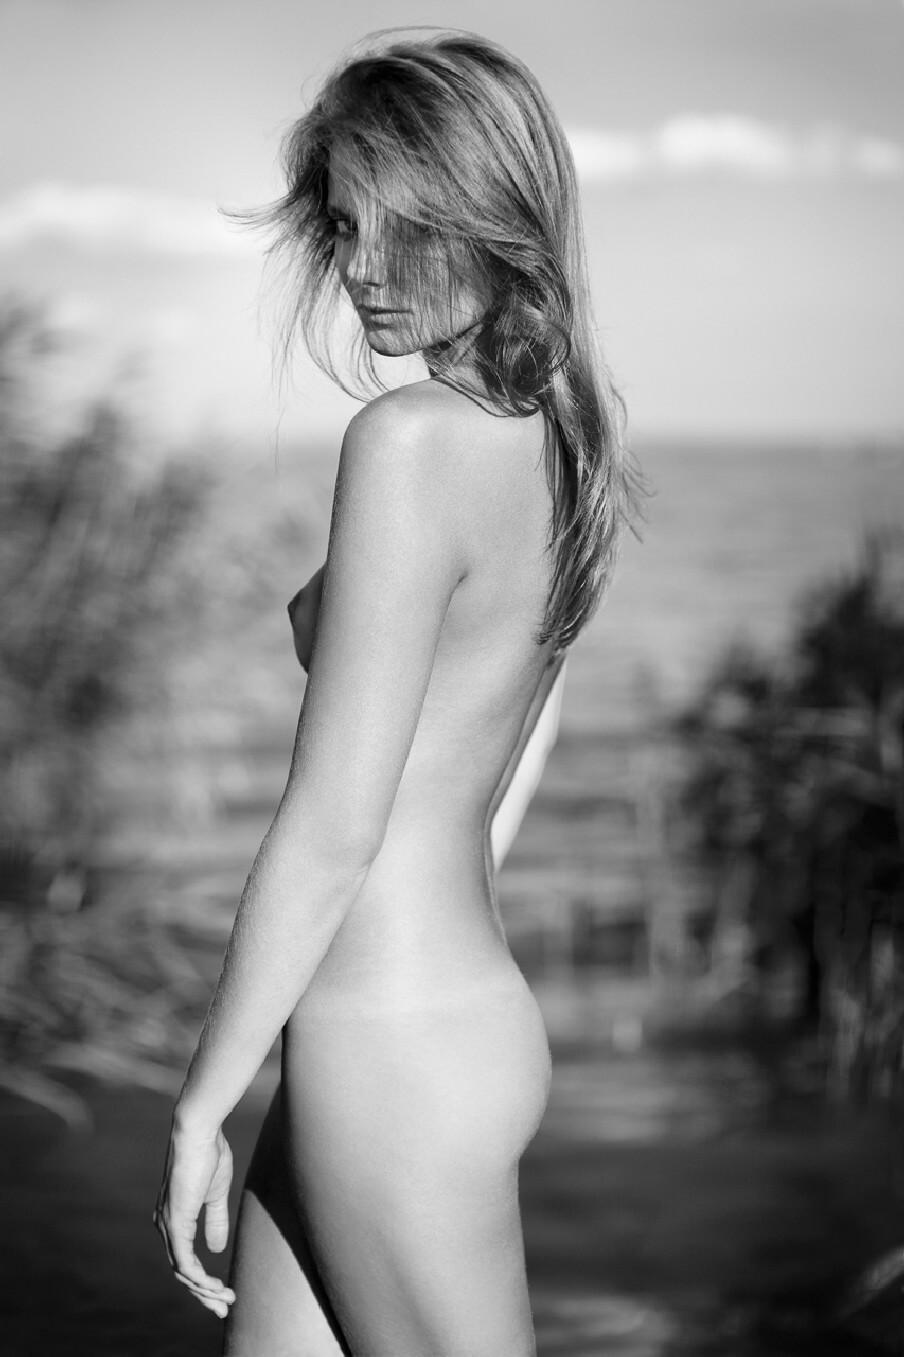 Fotos de mulheres gostosas HD